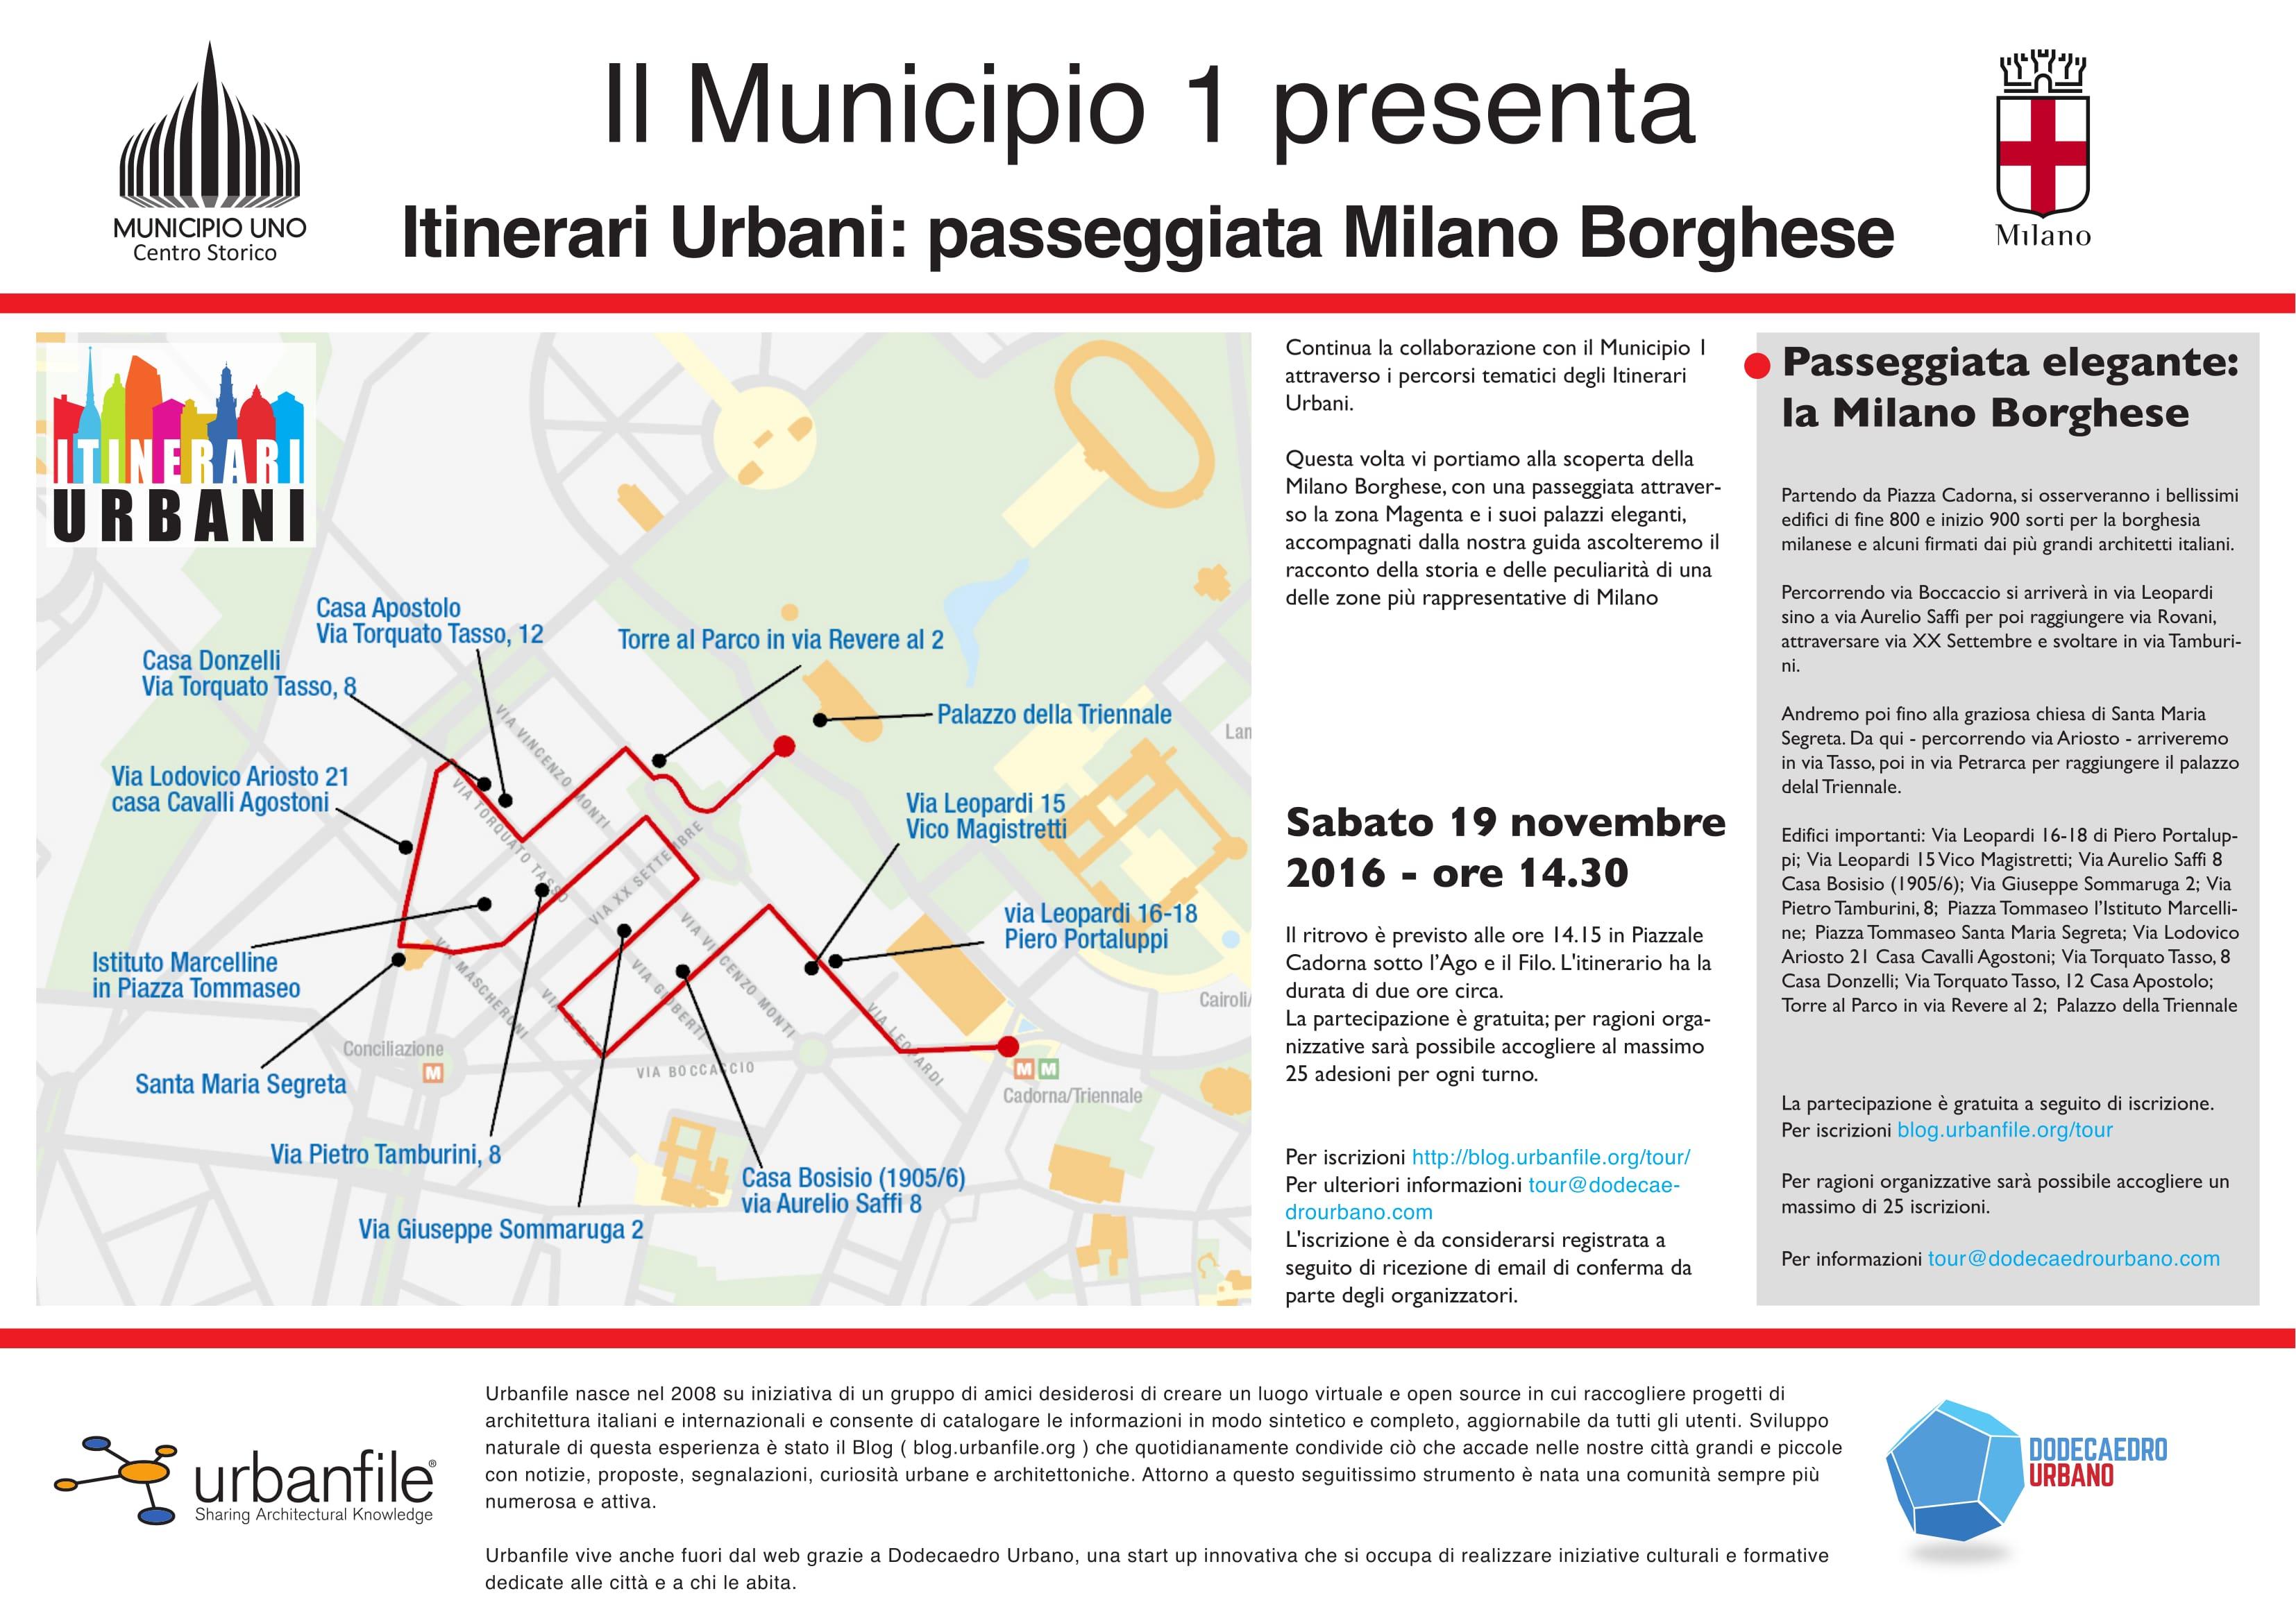 itinerari-urbani-milano-borghese-1